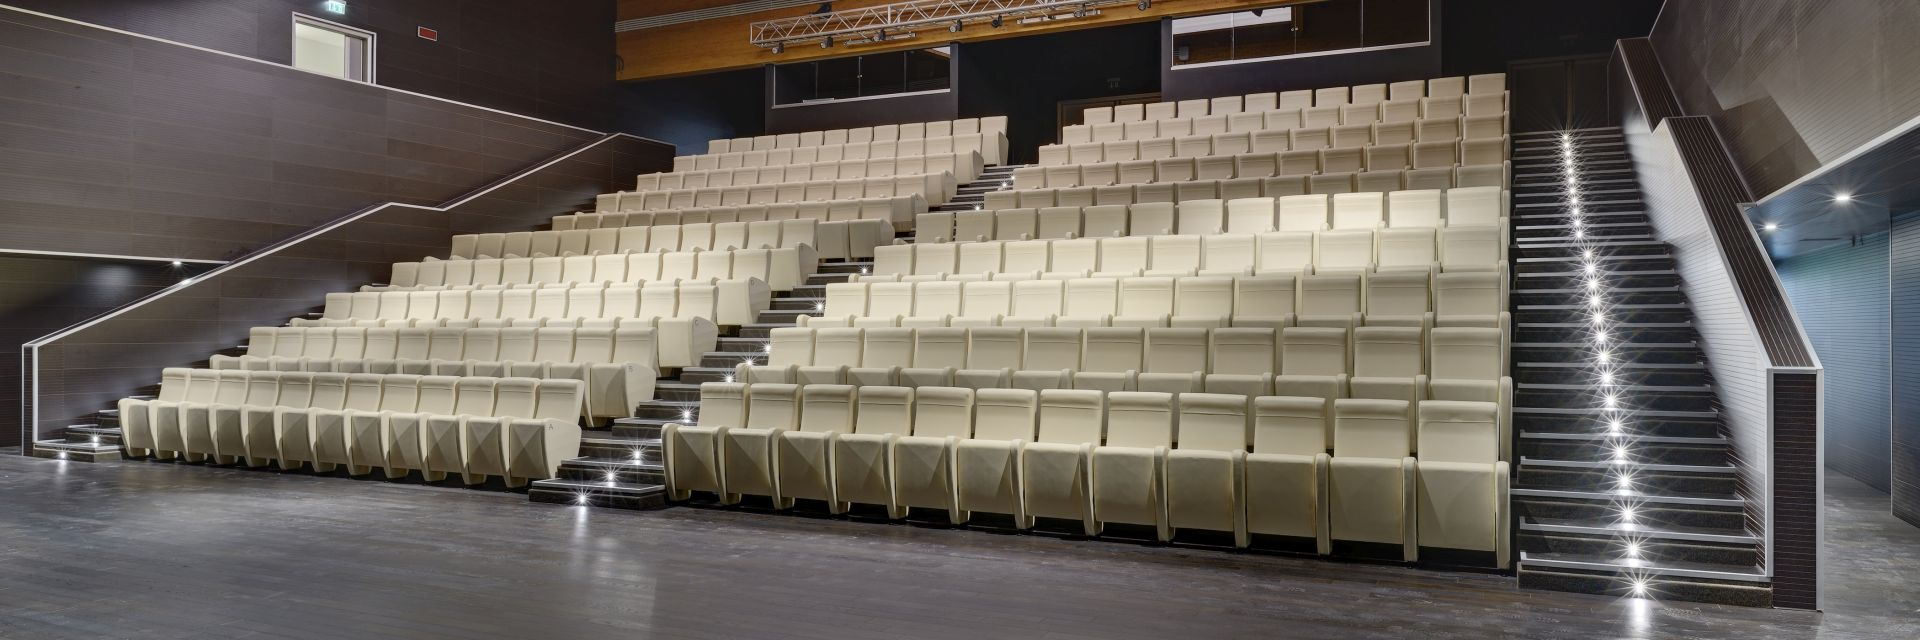 Teatro SanbàPolis - Platea